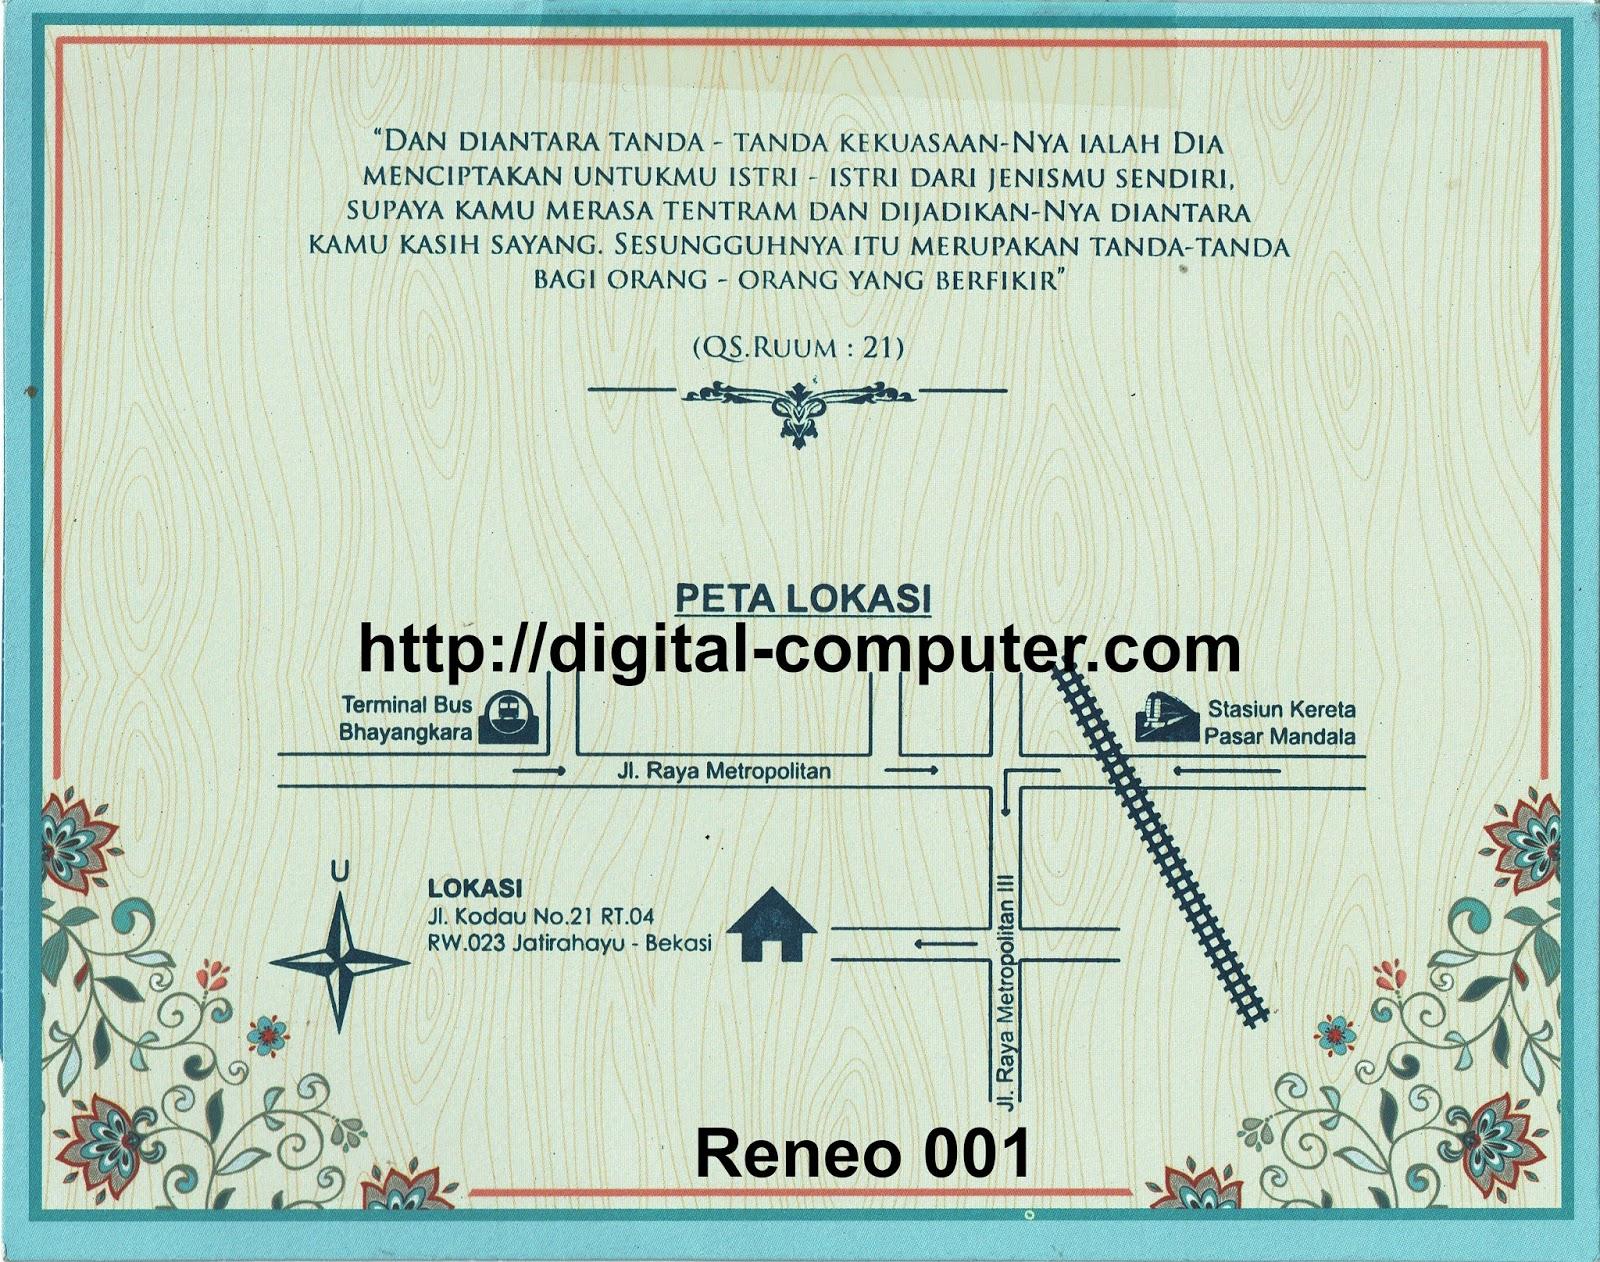 Undangan Softcover Reneo 001